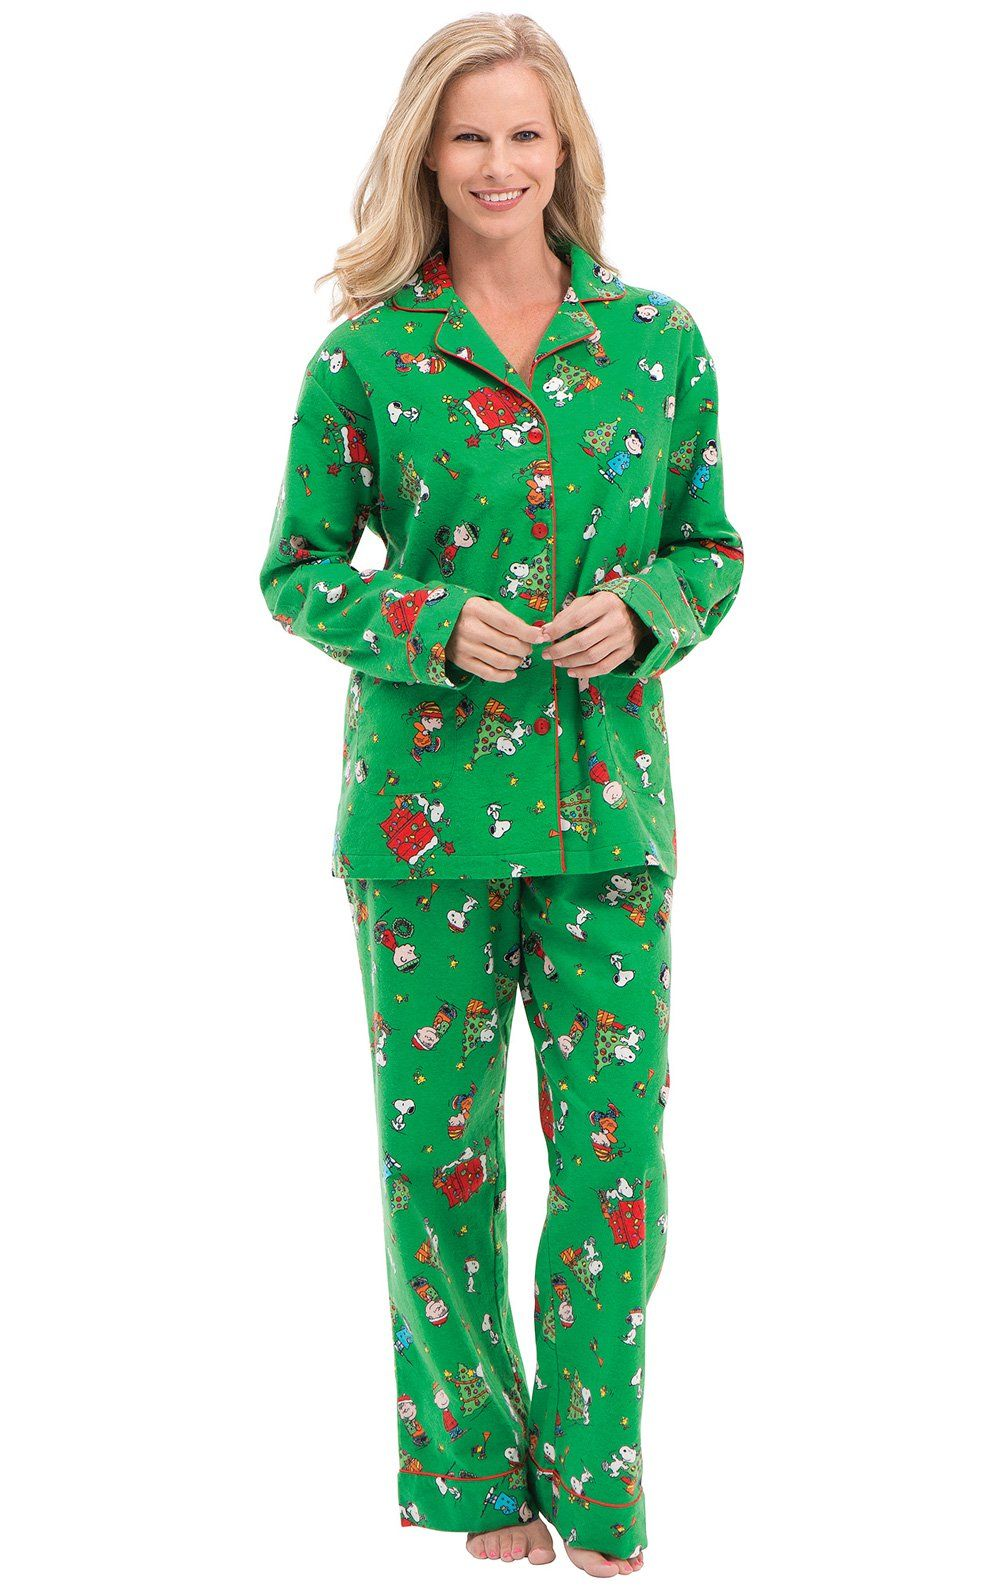 b6d1682d0812 Charlie Brown Christmas Matching Family Pajamas